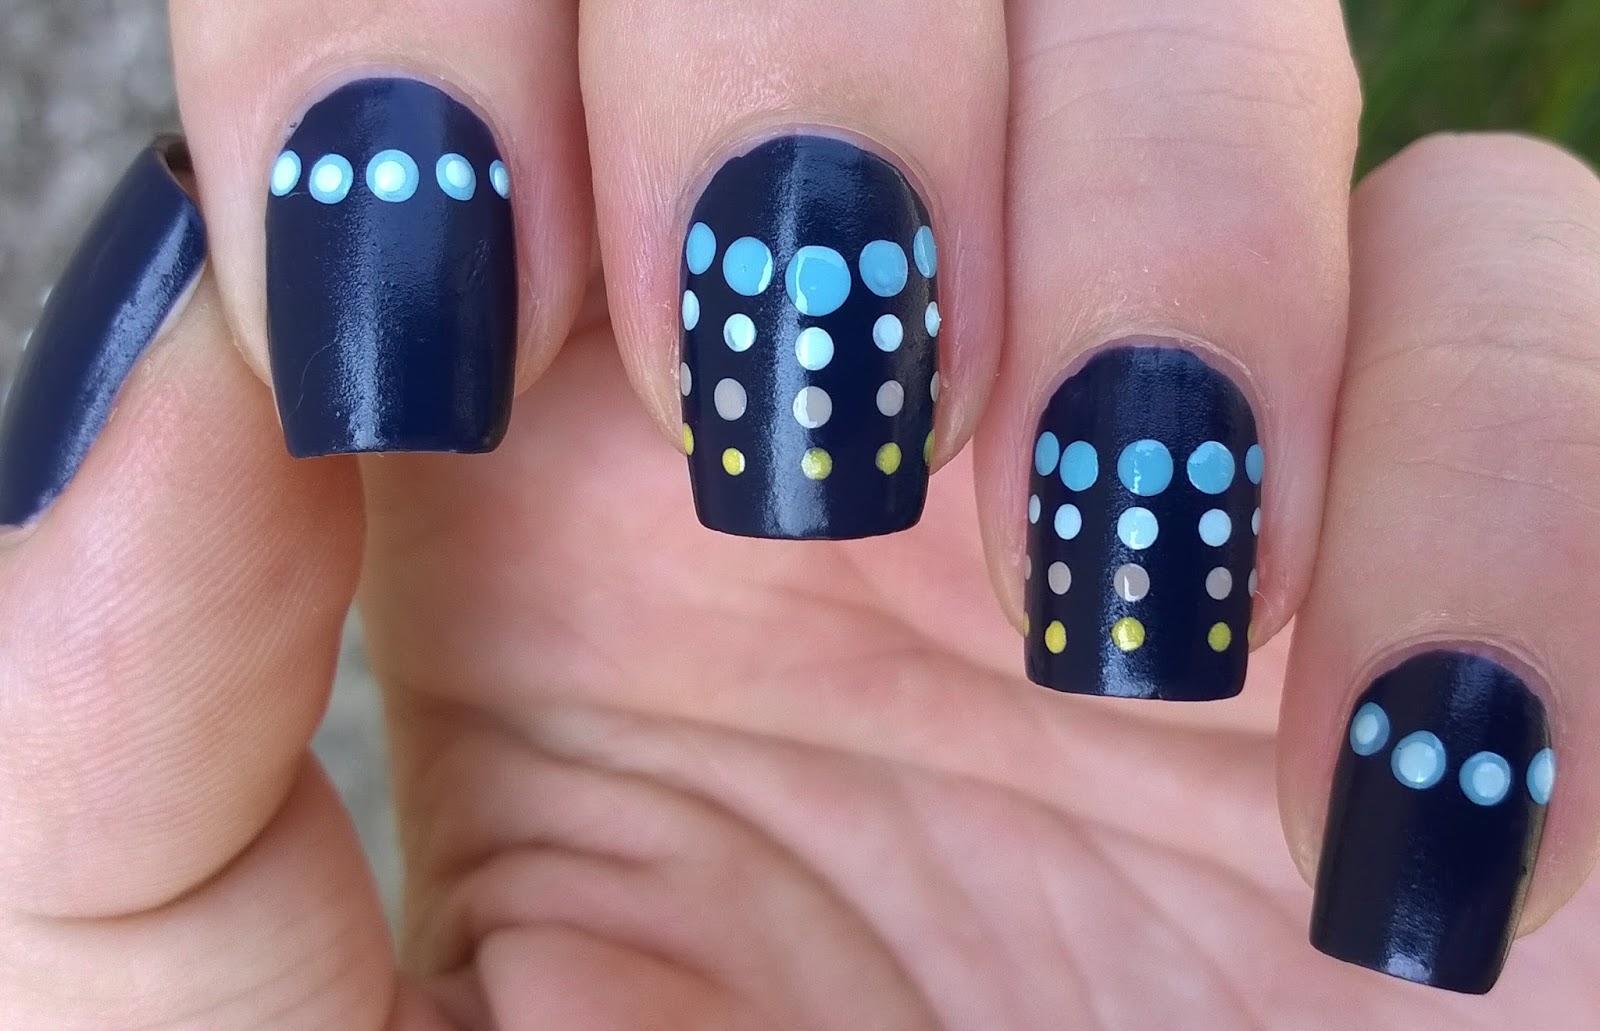 Life World Women: Dark Blue Dotticure Nail Art Using \'Suede\' Nail Polish